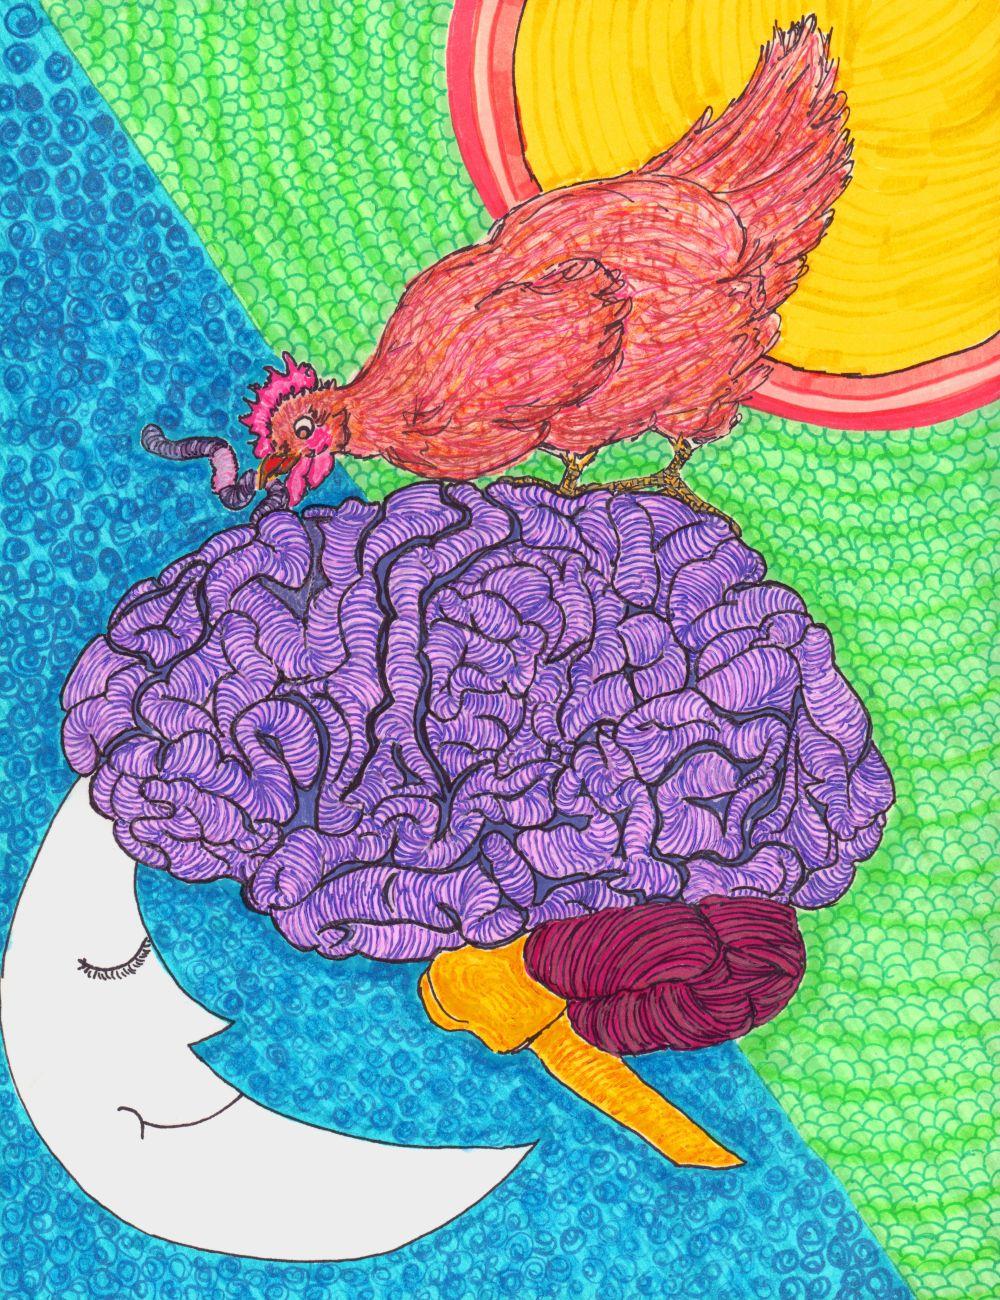 The Chicken on the Brain